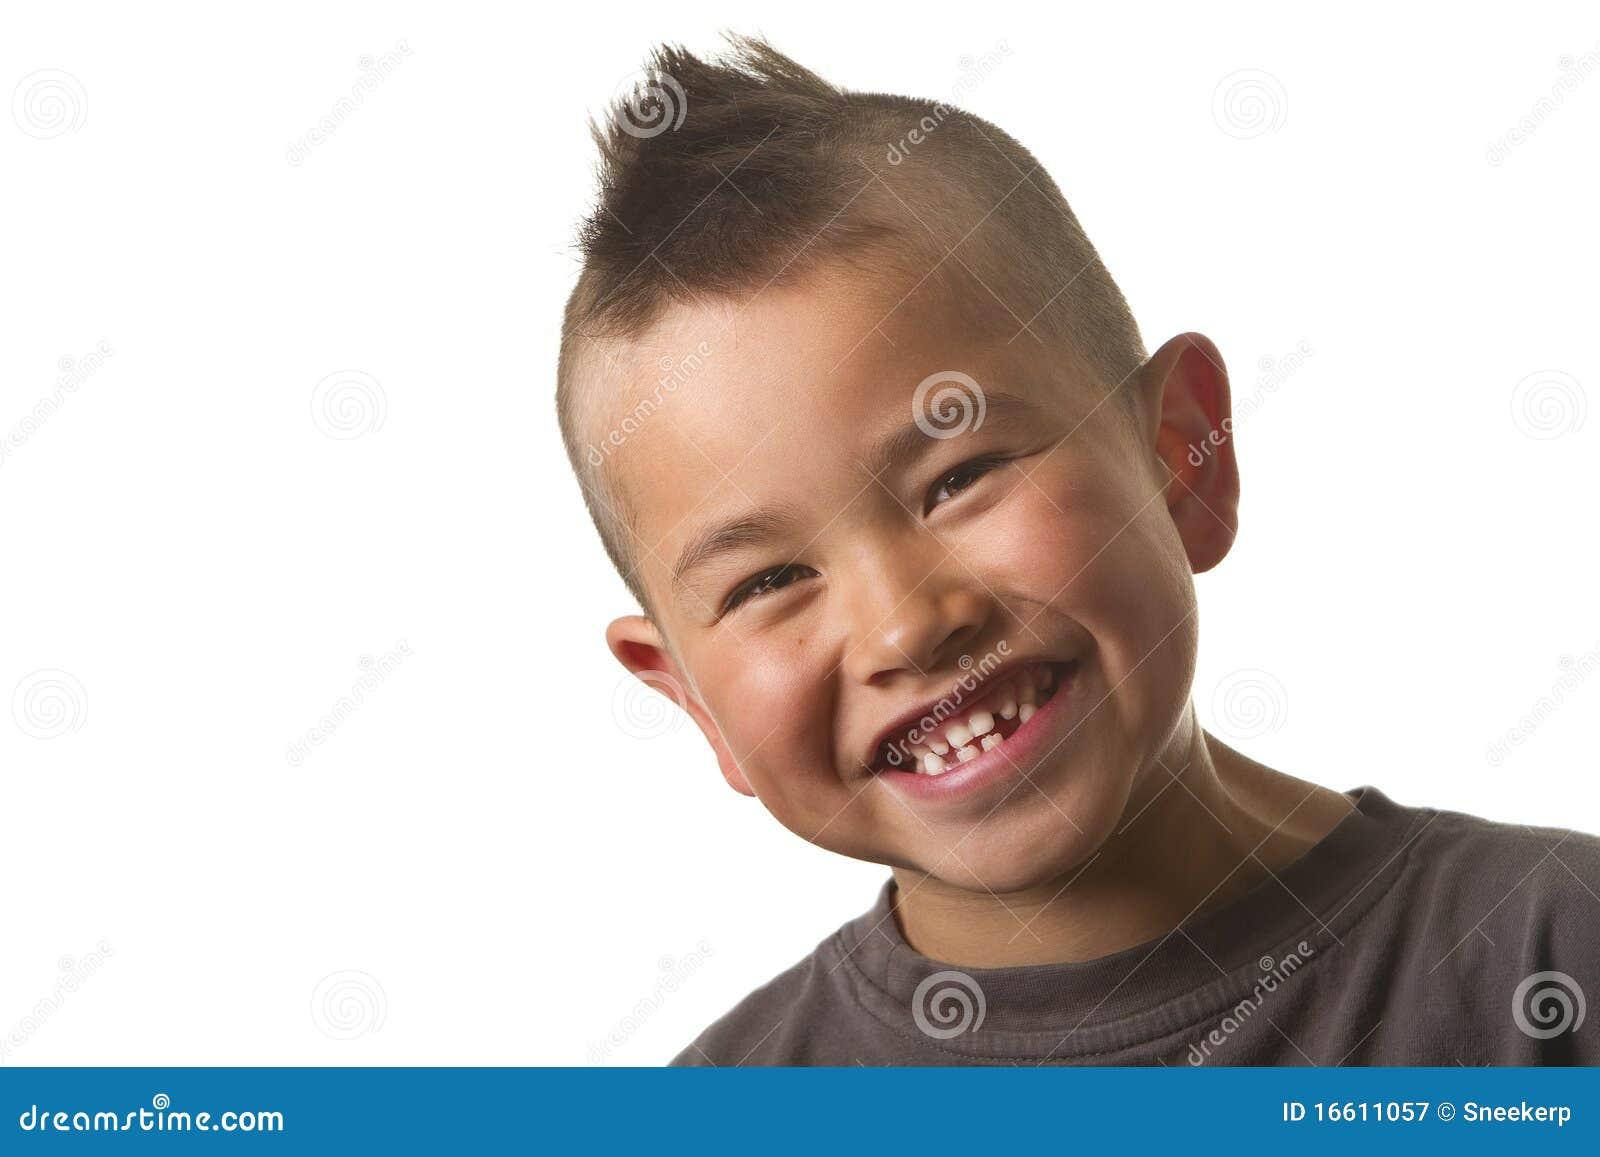 halsbetændelse barn anime dating sim